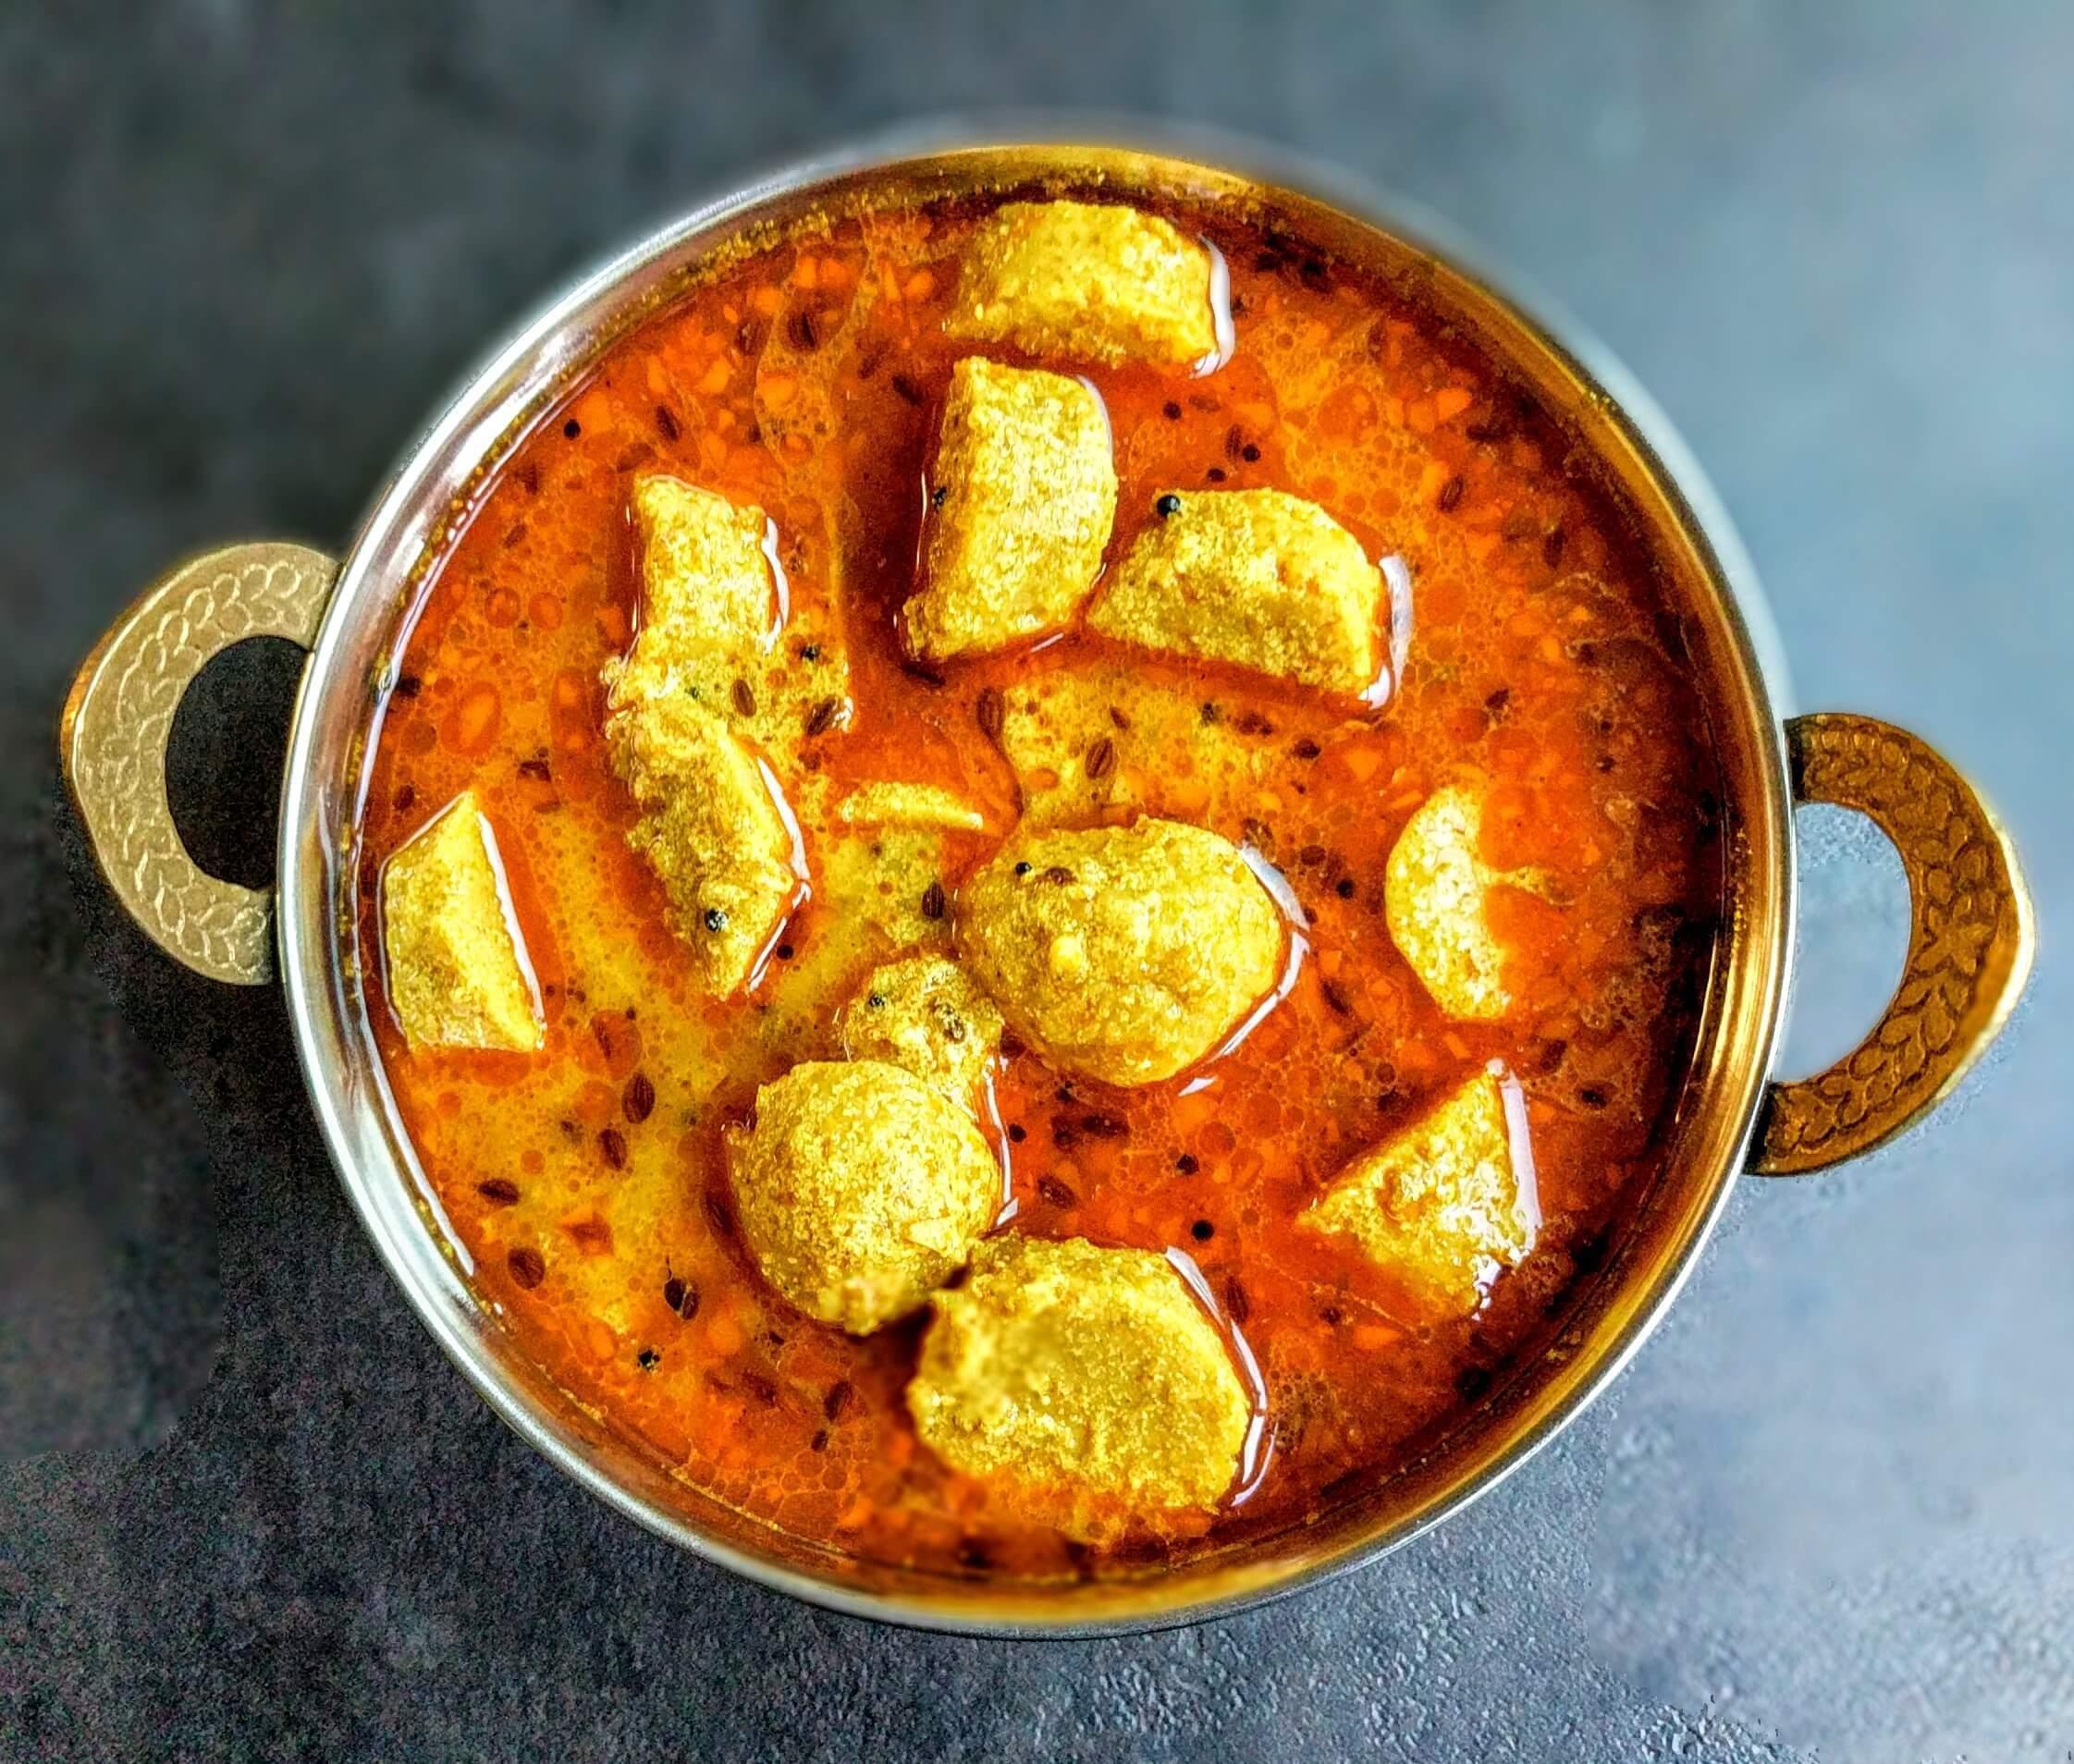 Gatte ki sabzi recipe step by step instructions